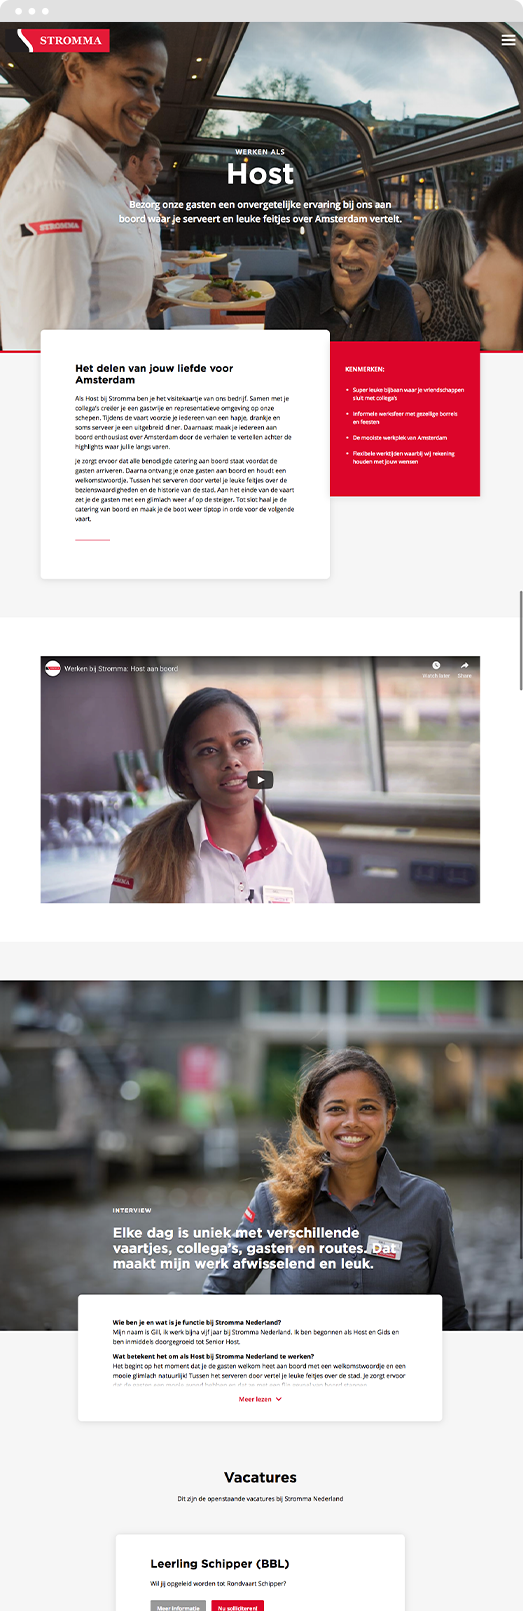 Screenshot of Drupal landing page design for Stromma recruitment